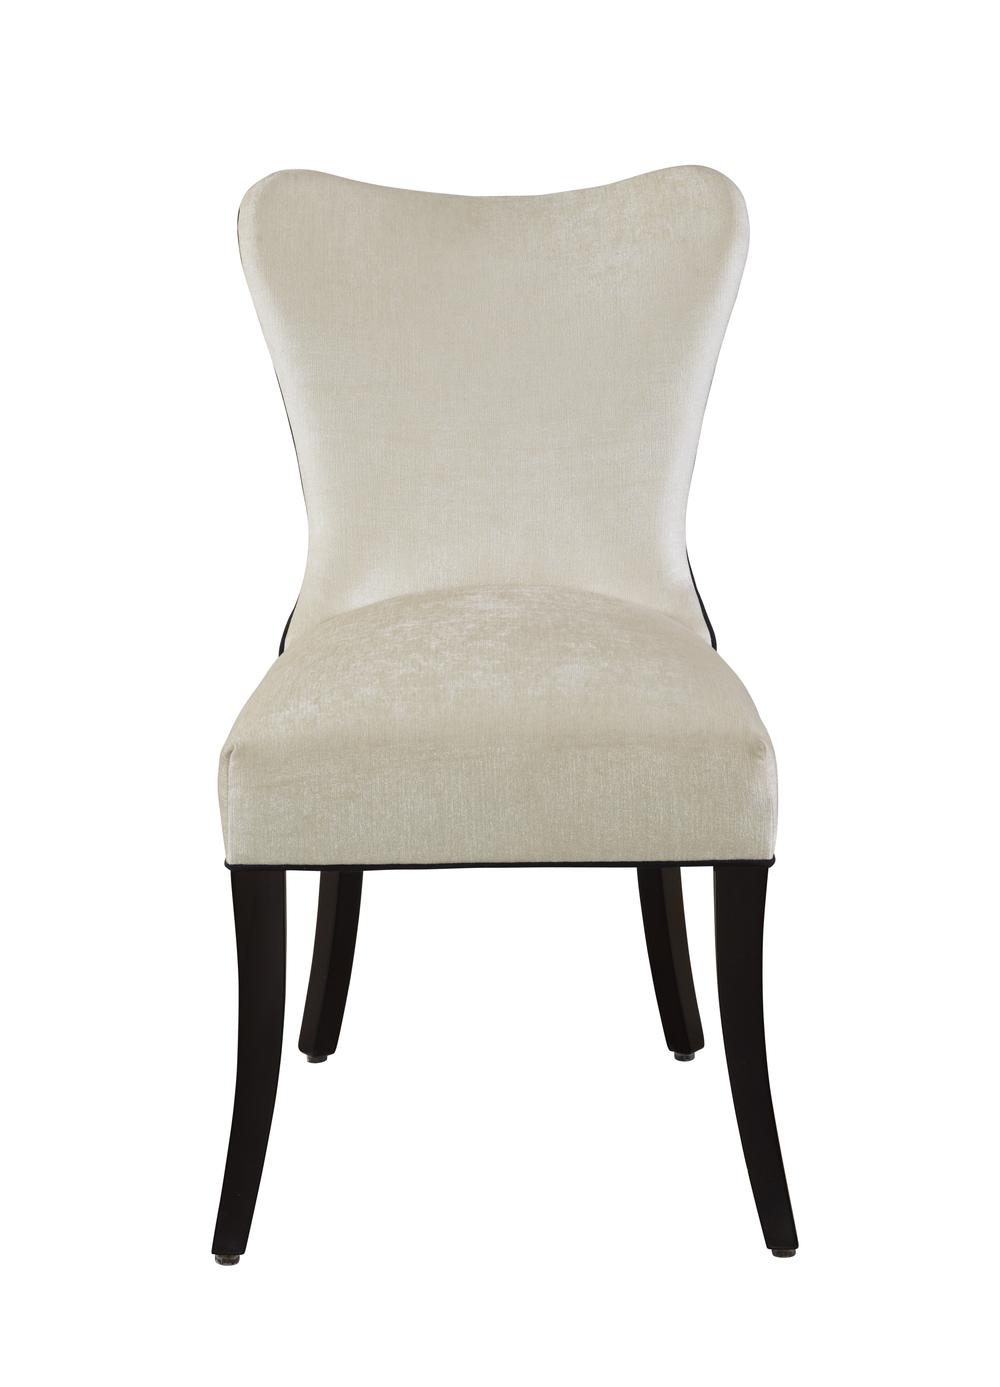 Designmaster Furniture - Denmark Studio Chair